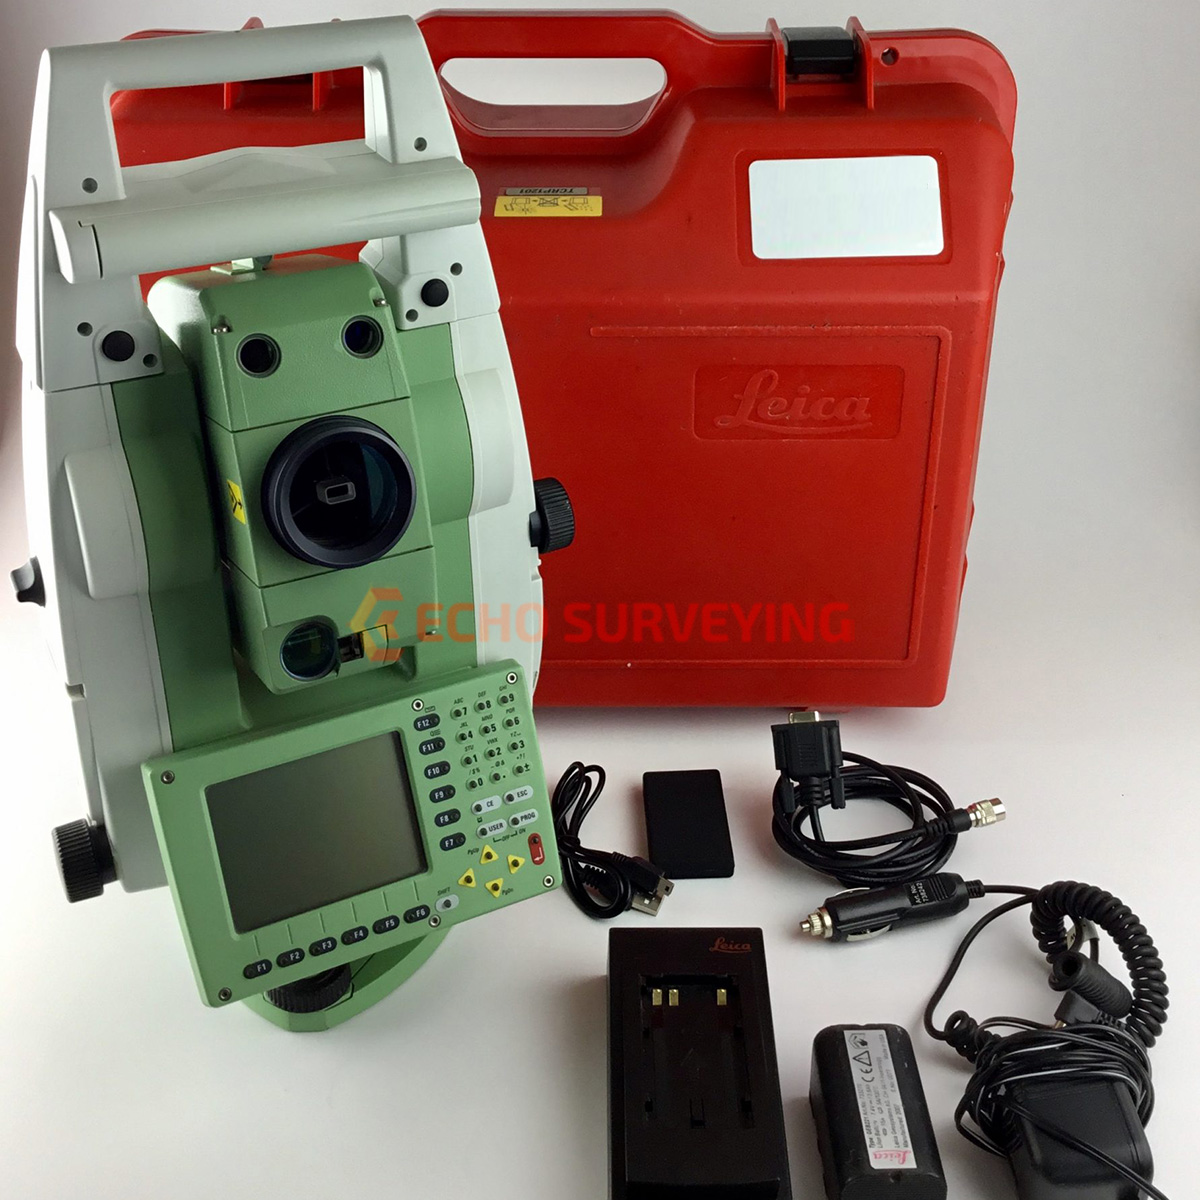 Leica-TCRP1201-R300-Robotic-Total-Station.jpg